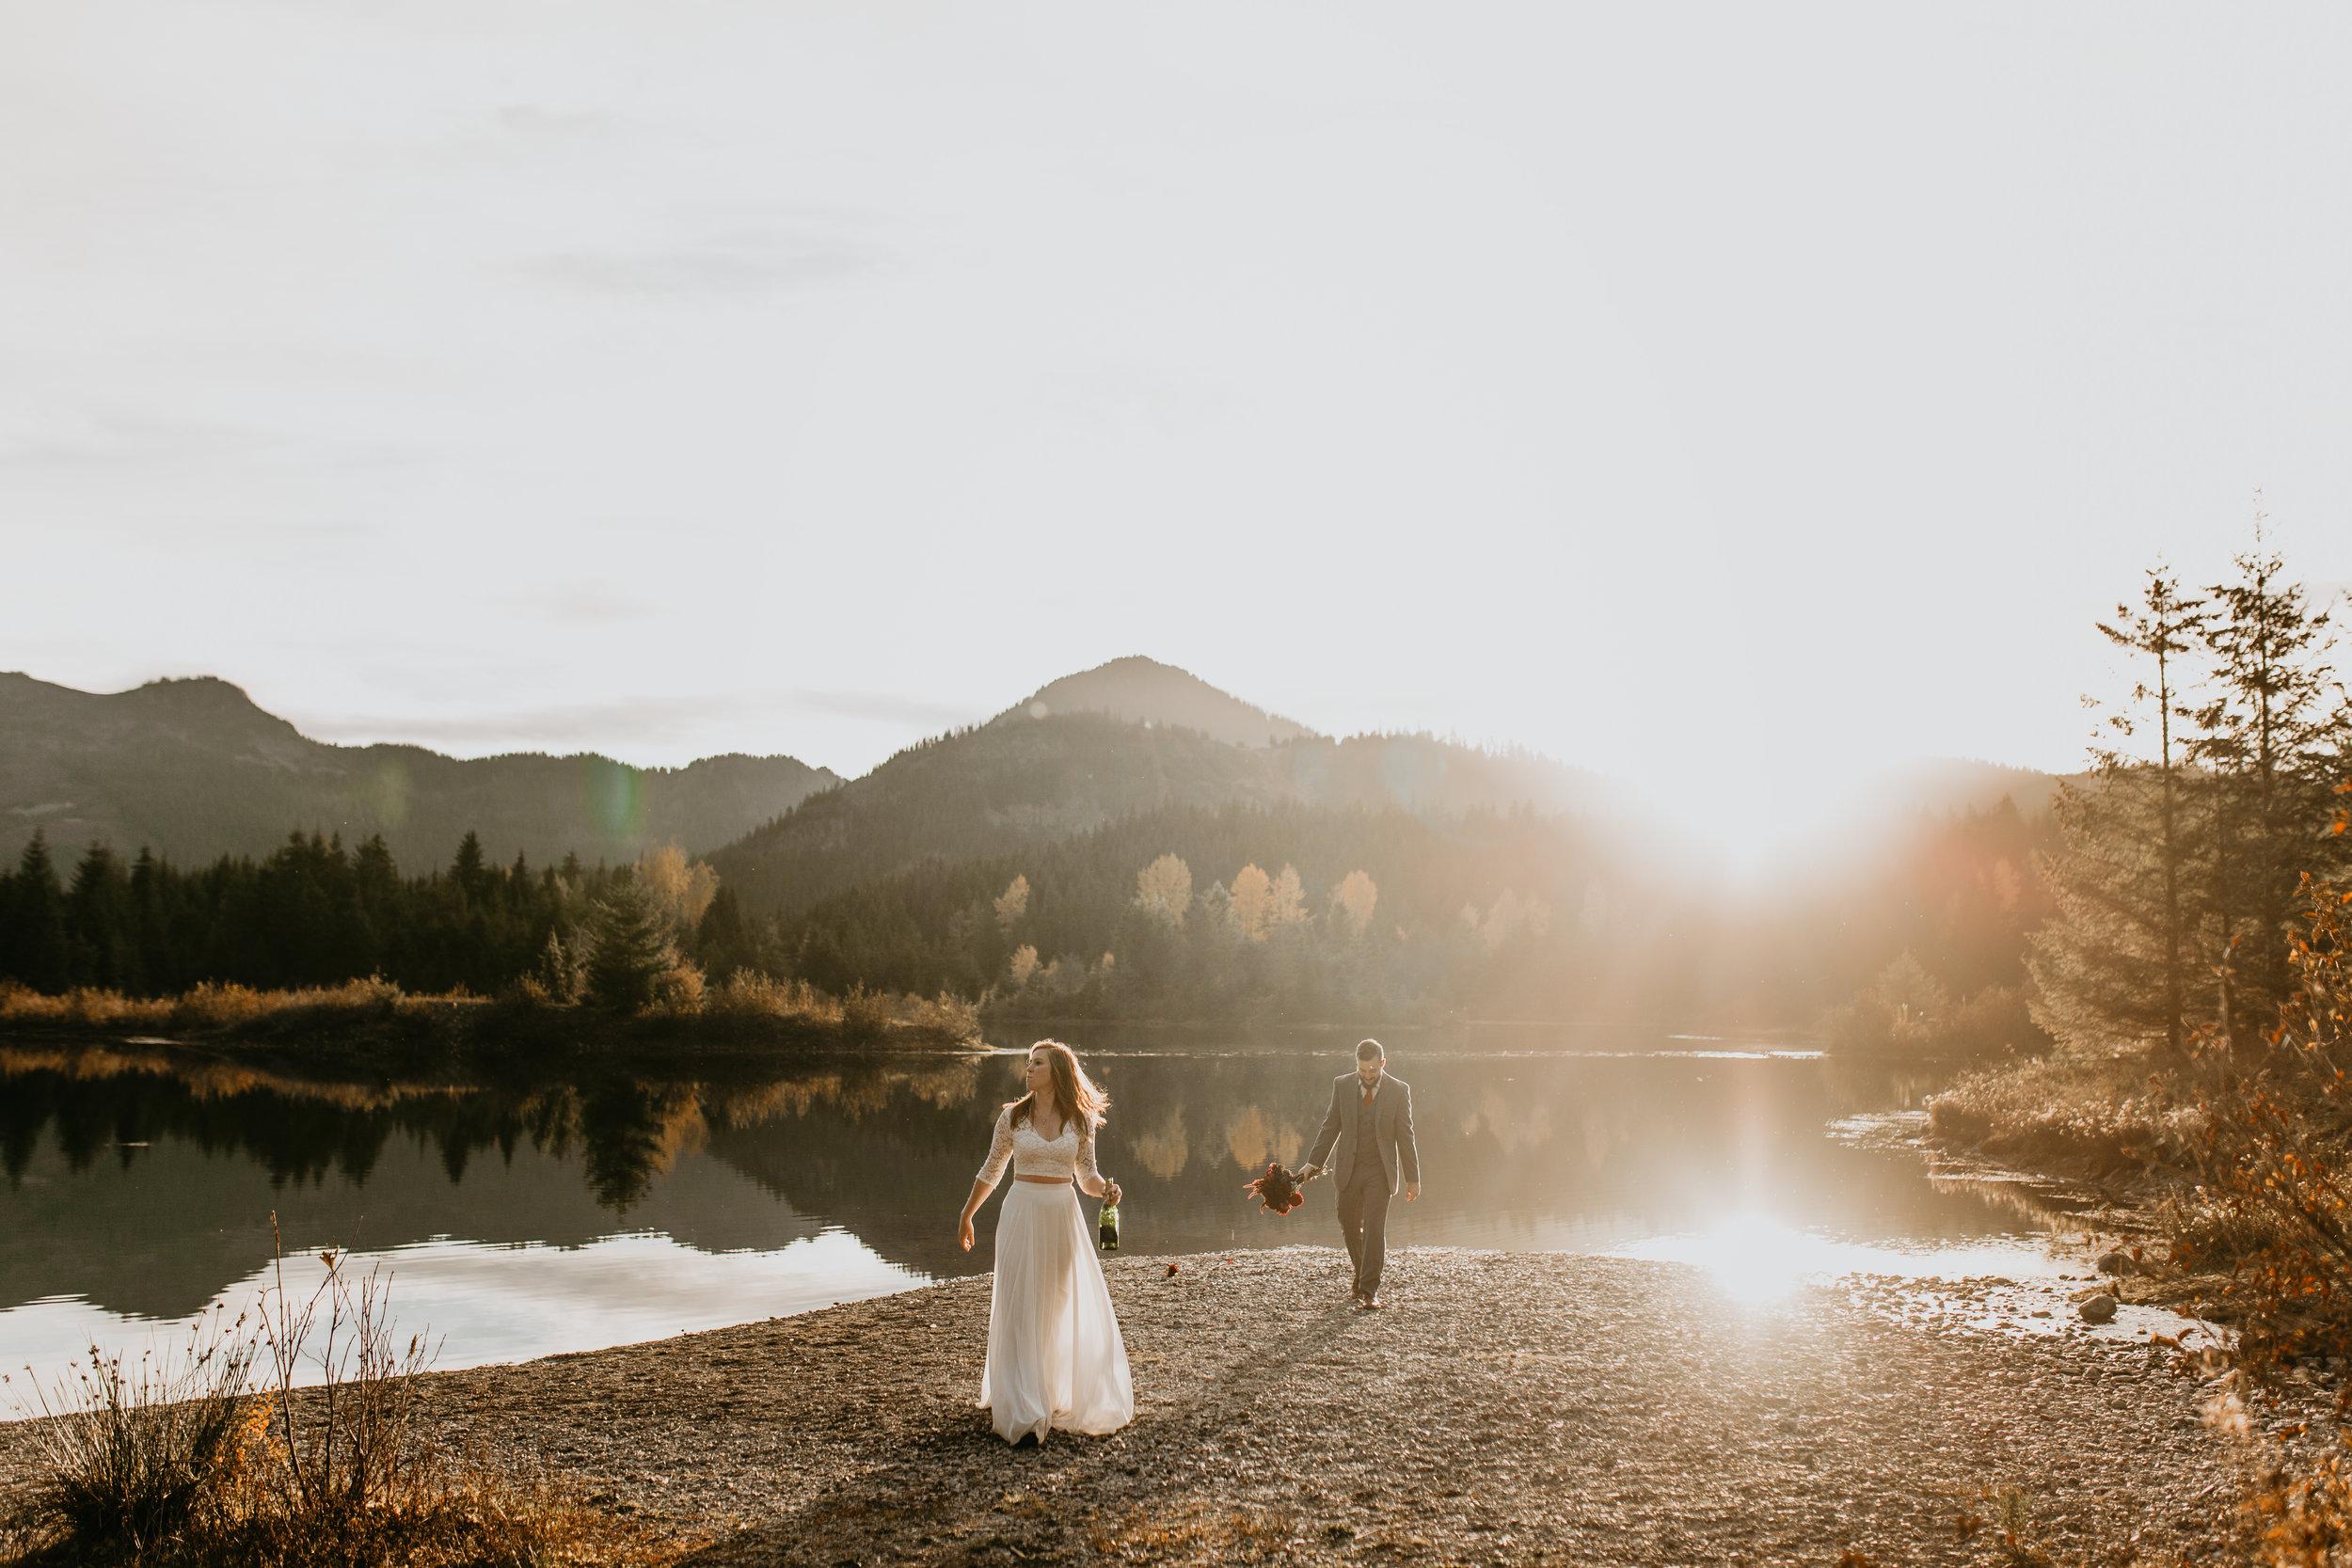 nicole-daacke-photography-mountain-view-elopement-at-gold-creek-pond-snoqualmie-washington-wa-elopement-photographer-photography-adventure-elopement-in-washington-fall-lakeside-golden-sunset-boho-fun-bride-0467.jpg